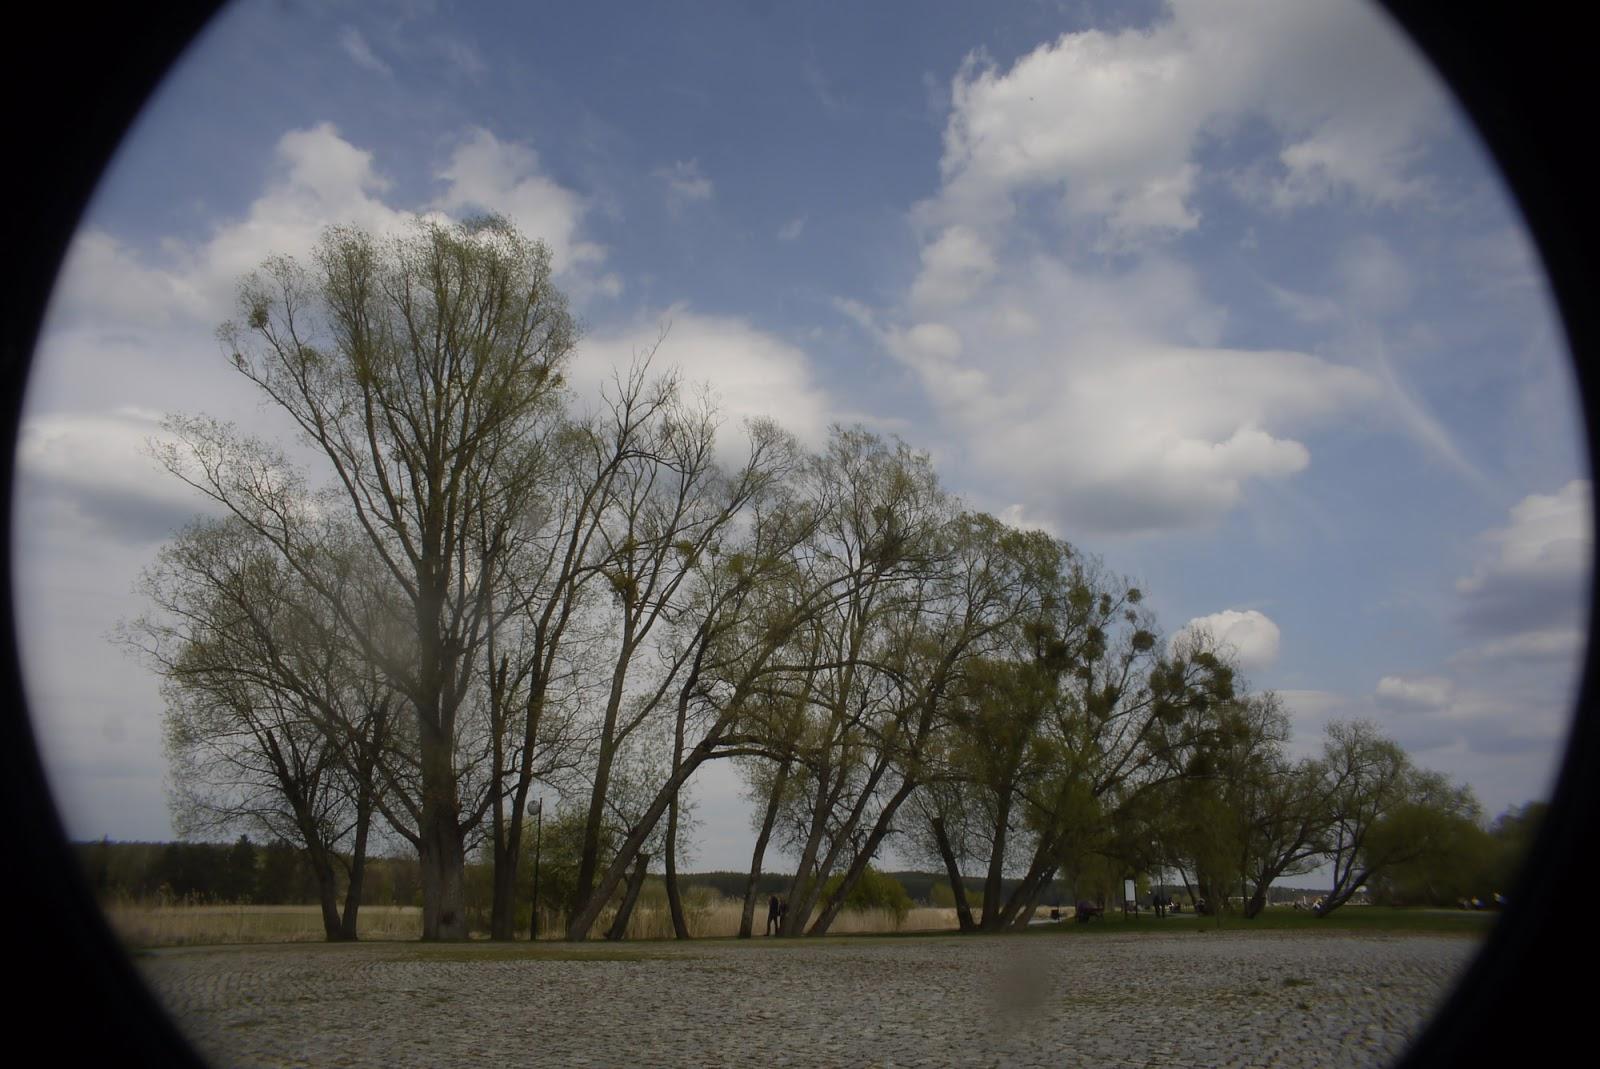 Cosmicar 12.5/1.9 @22 - landscape (2:3 crop).